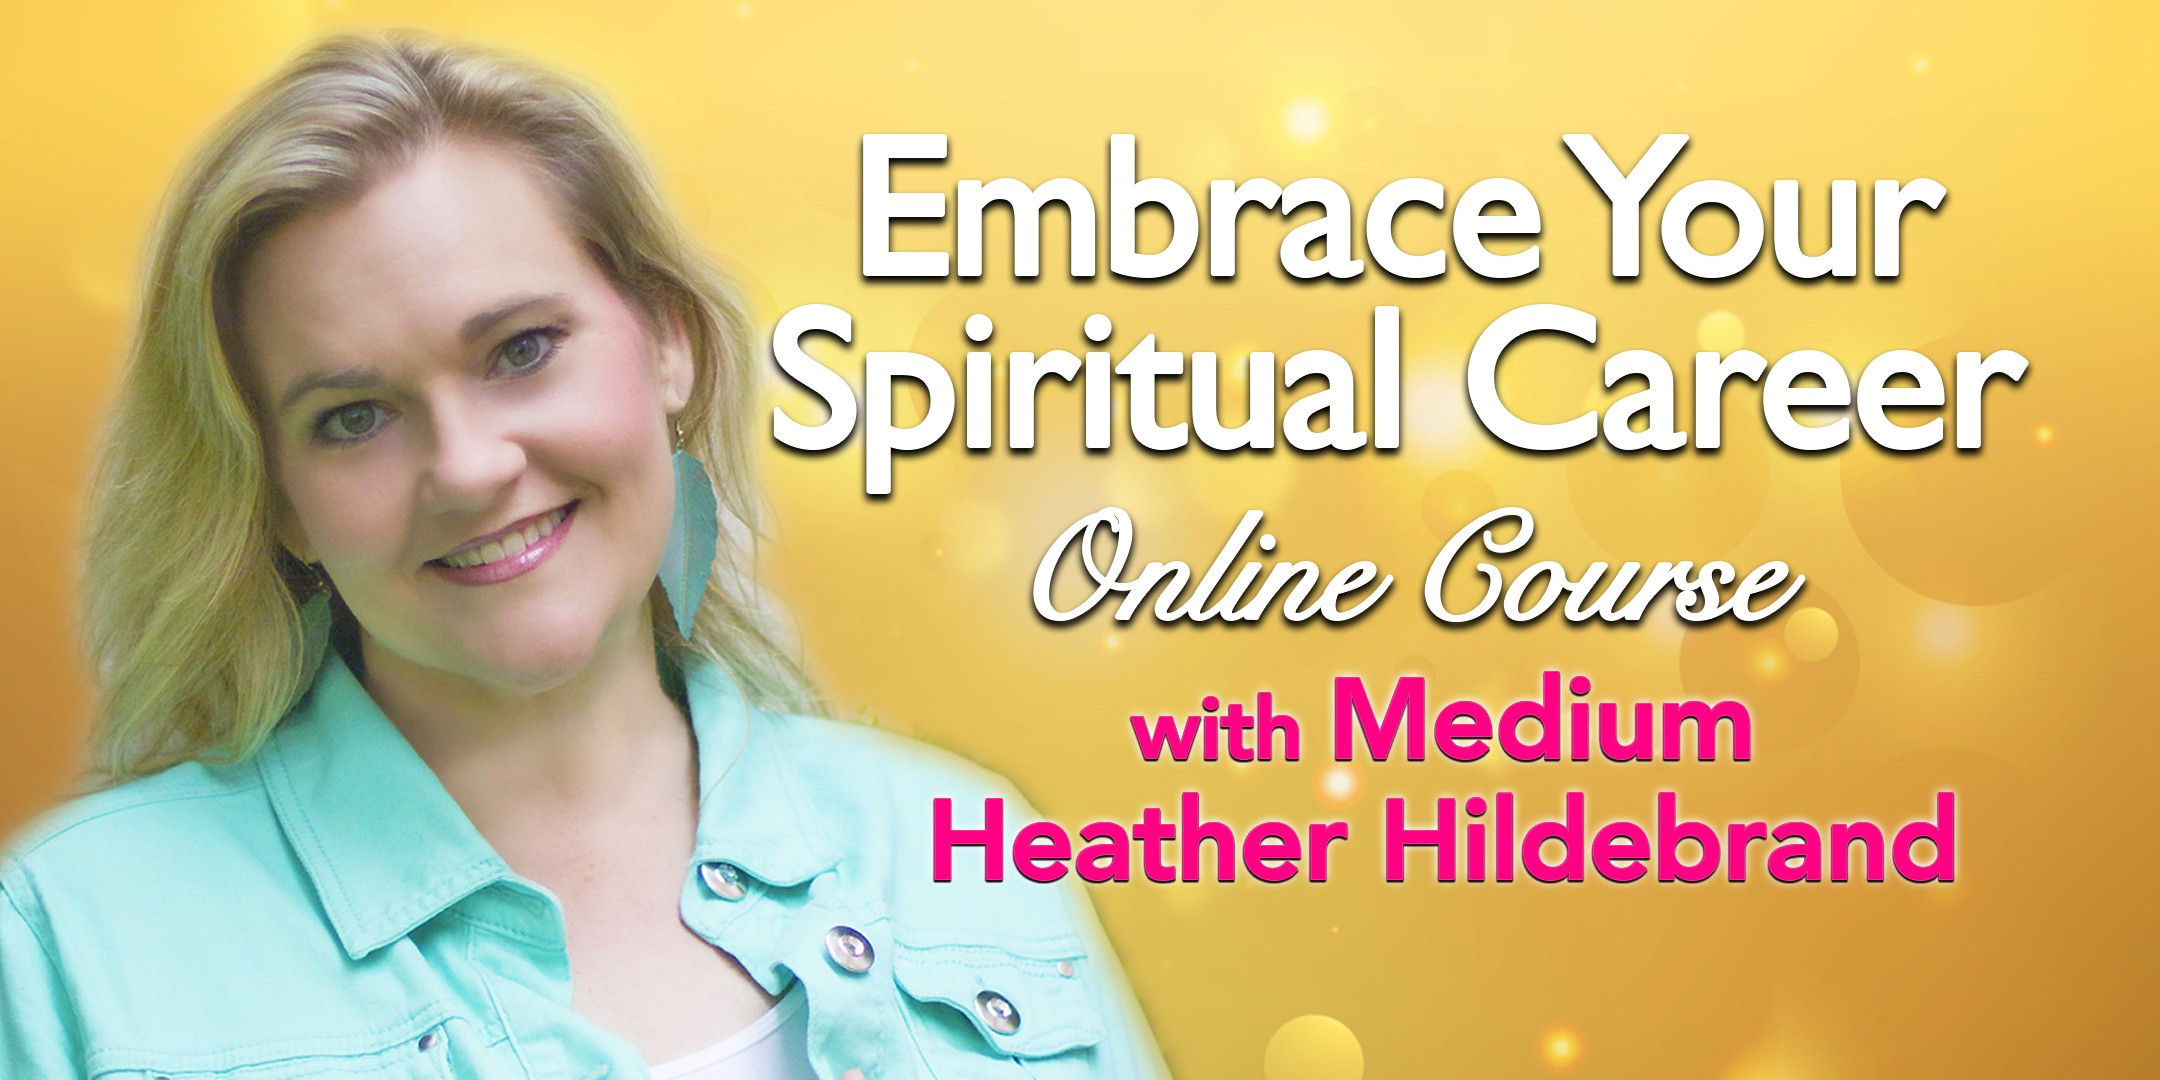 Spiritual Career with Heather Hildebrand